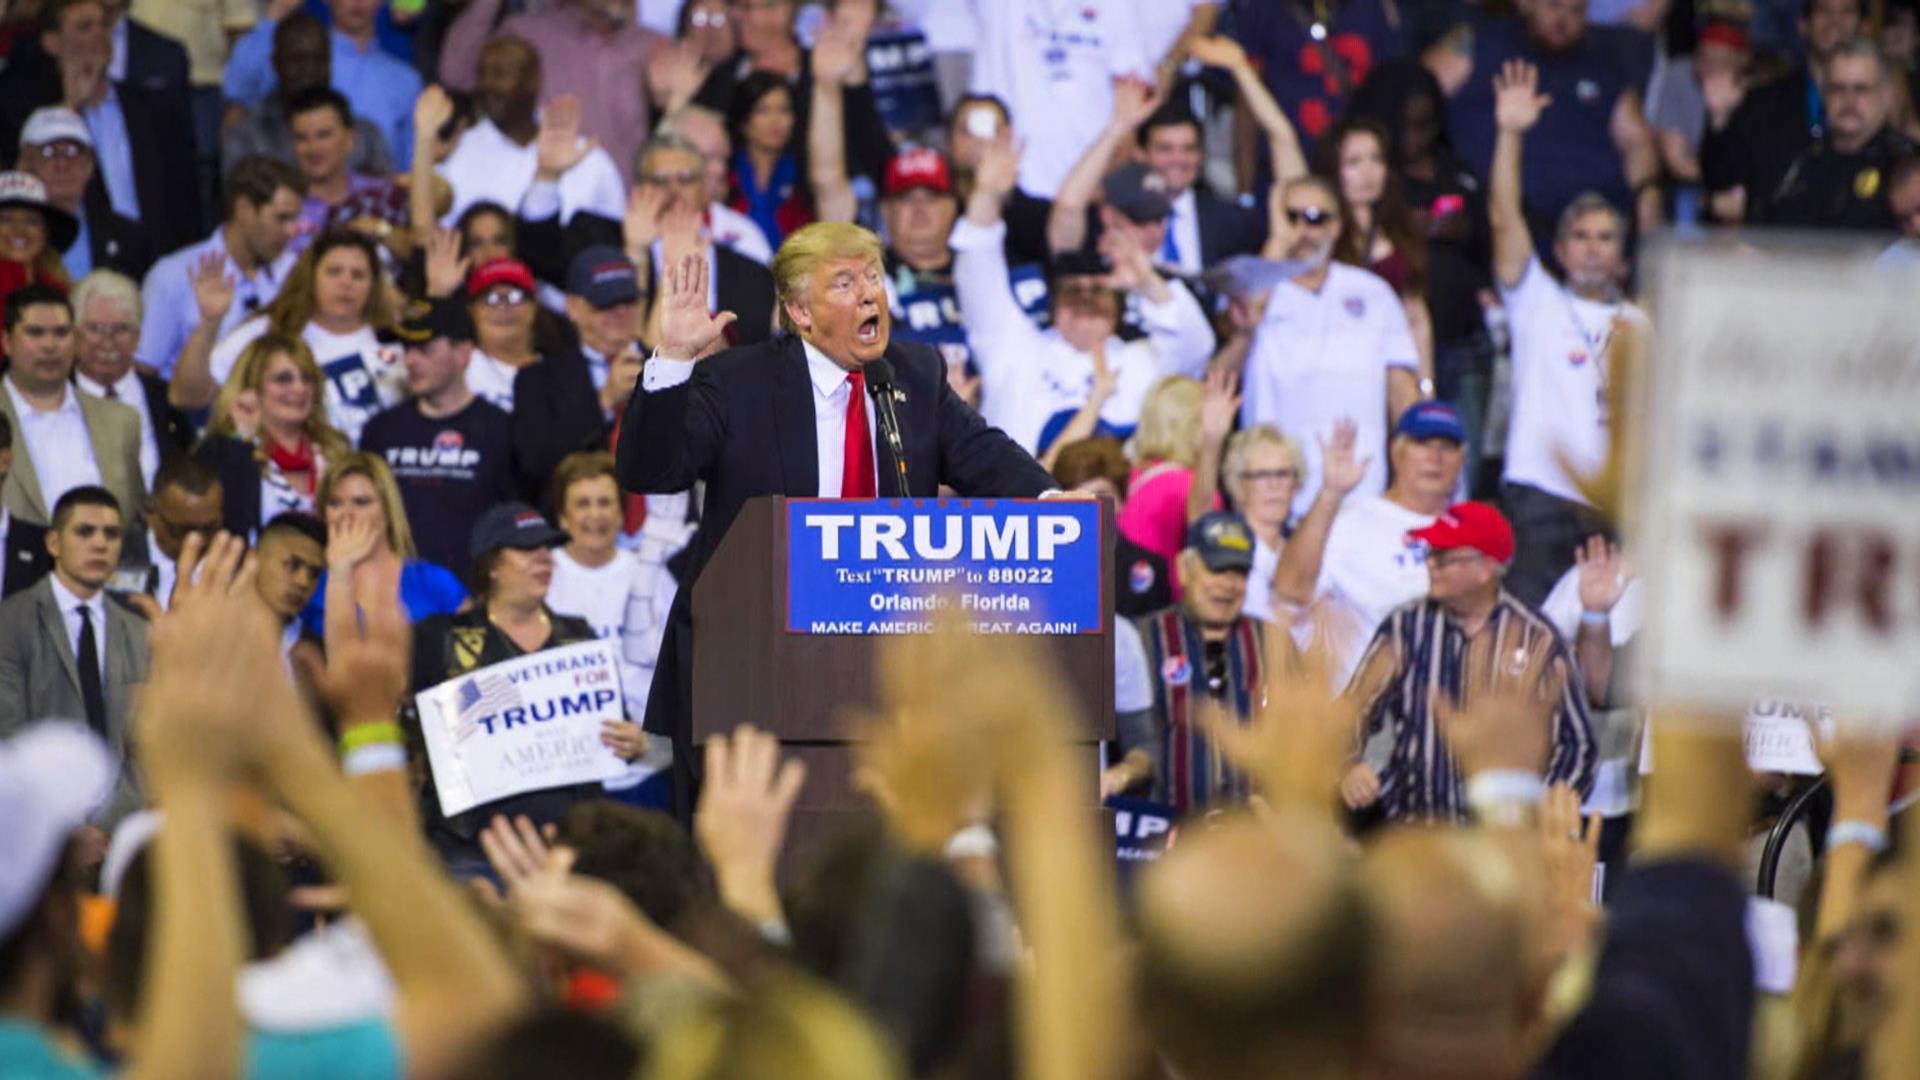 Donald Trump: Comparisons of Pledge to Nazi Salute 'Ridiculous'